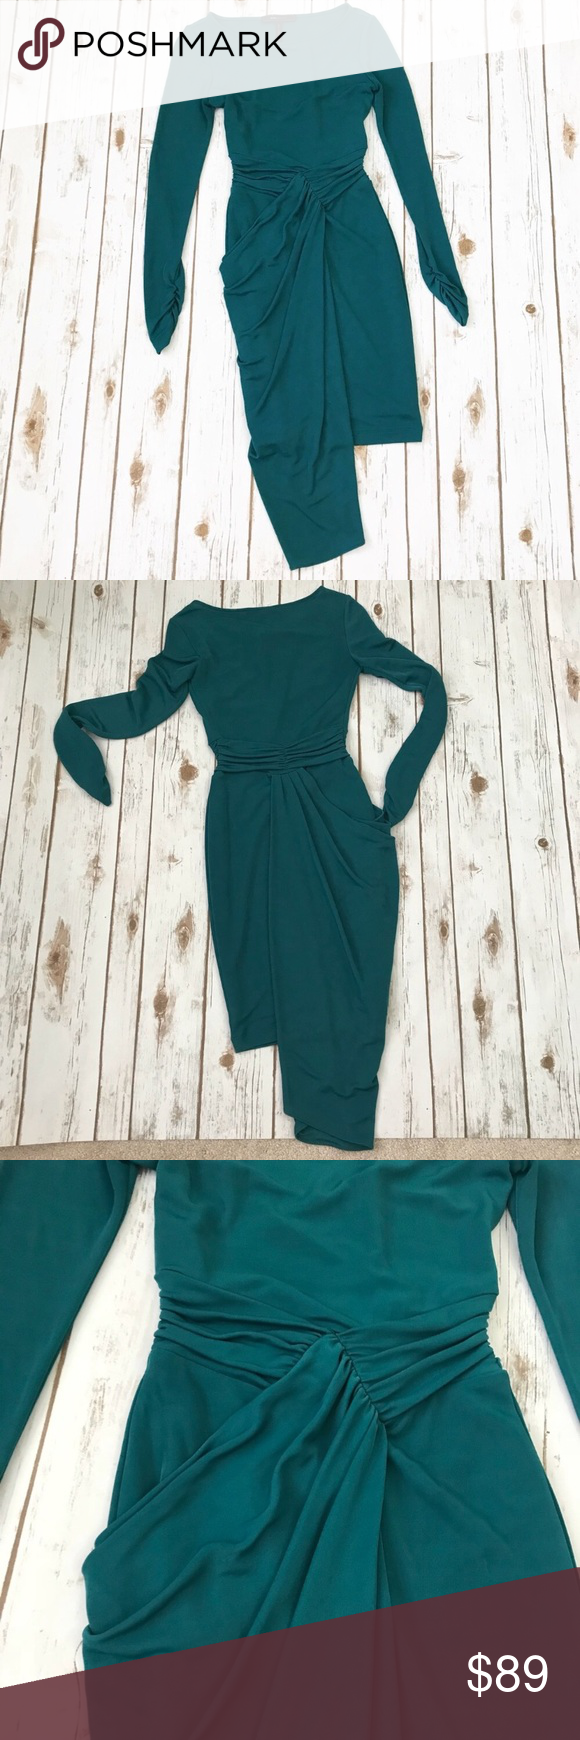 Green long sleeve cocktail dress  BCBG MaxAzria Sosie Jade Green Cocktail Dress  My Posh Closet